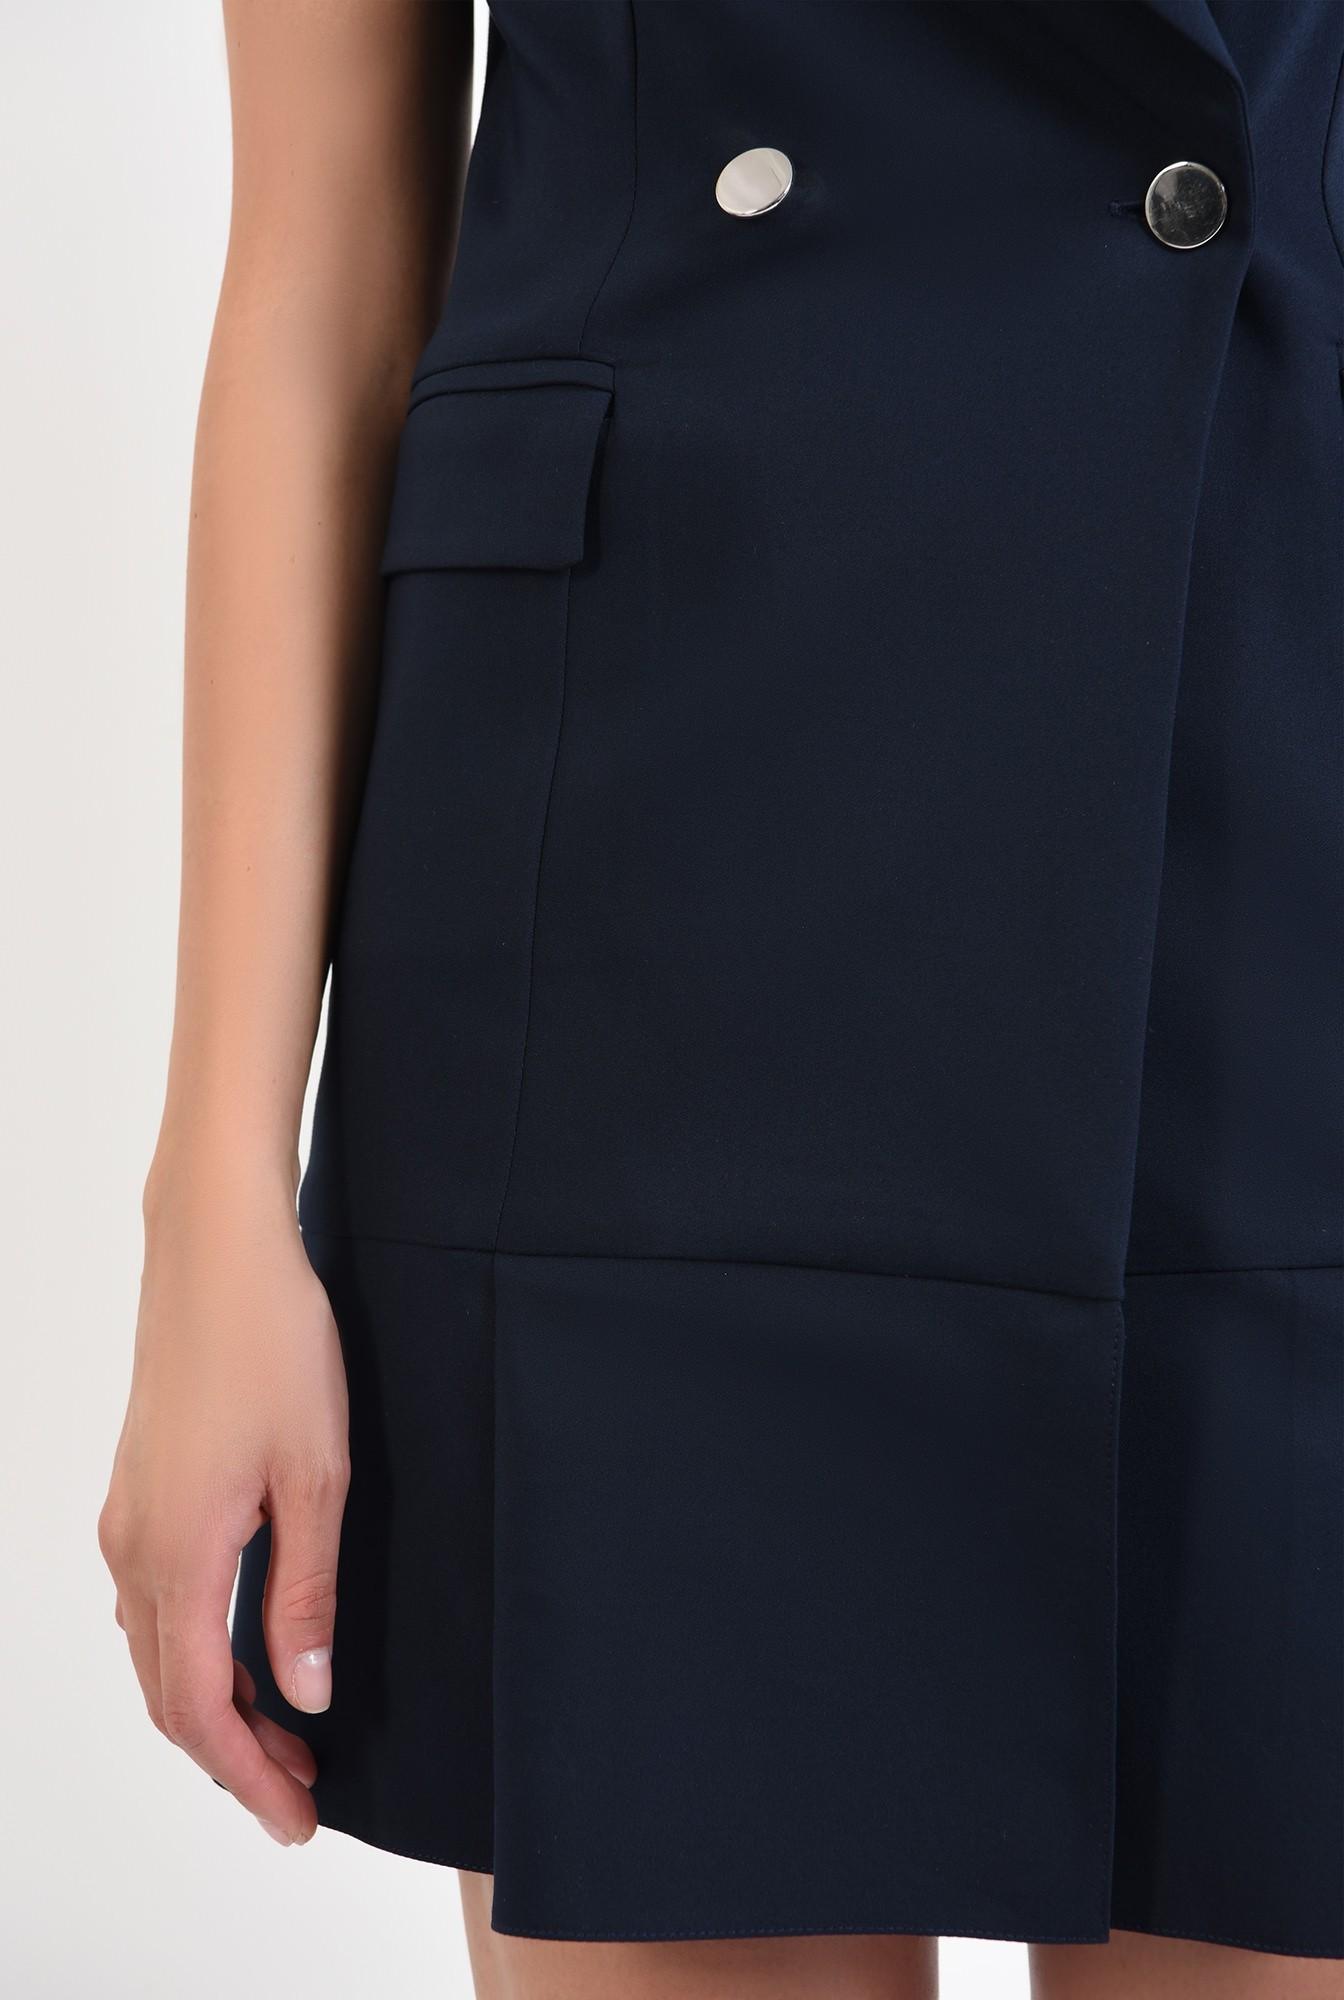 2 - 360 - rochie bleumarin, scurta, tip sacou, Poema